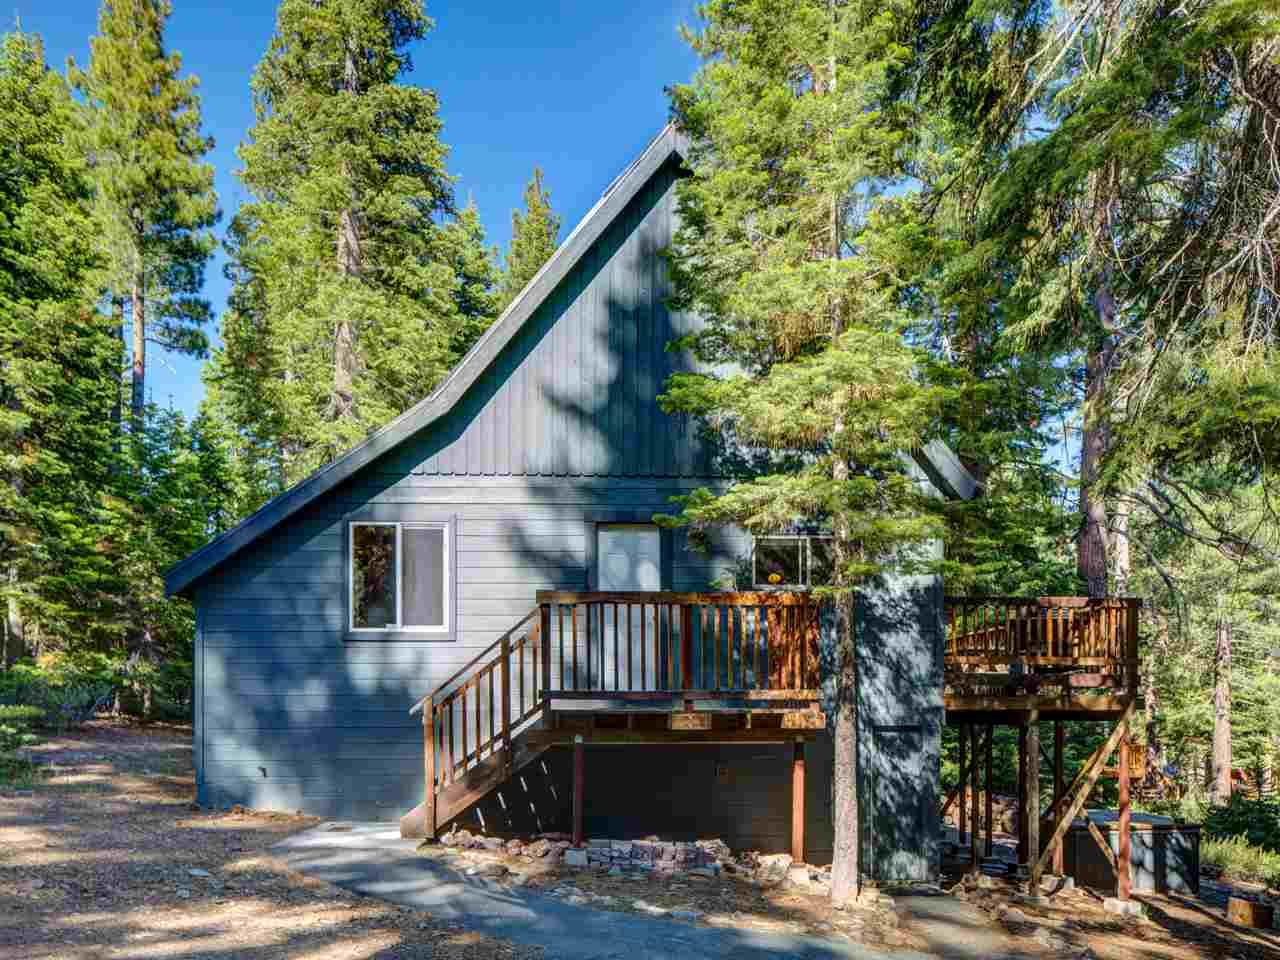 Single Family Home for Active at 690 Shamrock Road 690 Shamrock Road Tahoe City, California 96140 United States